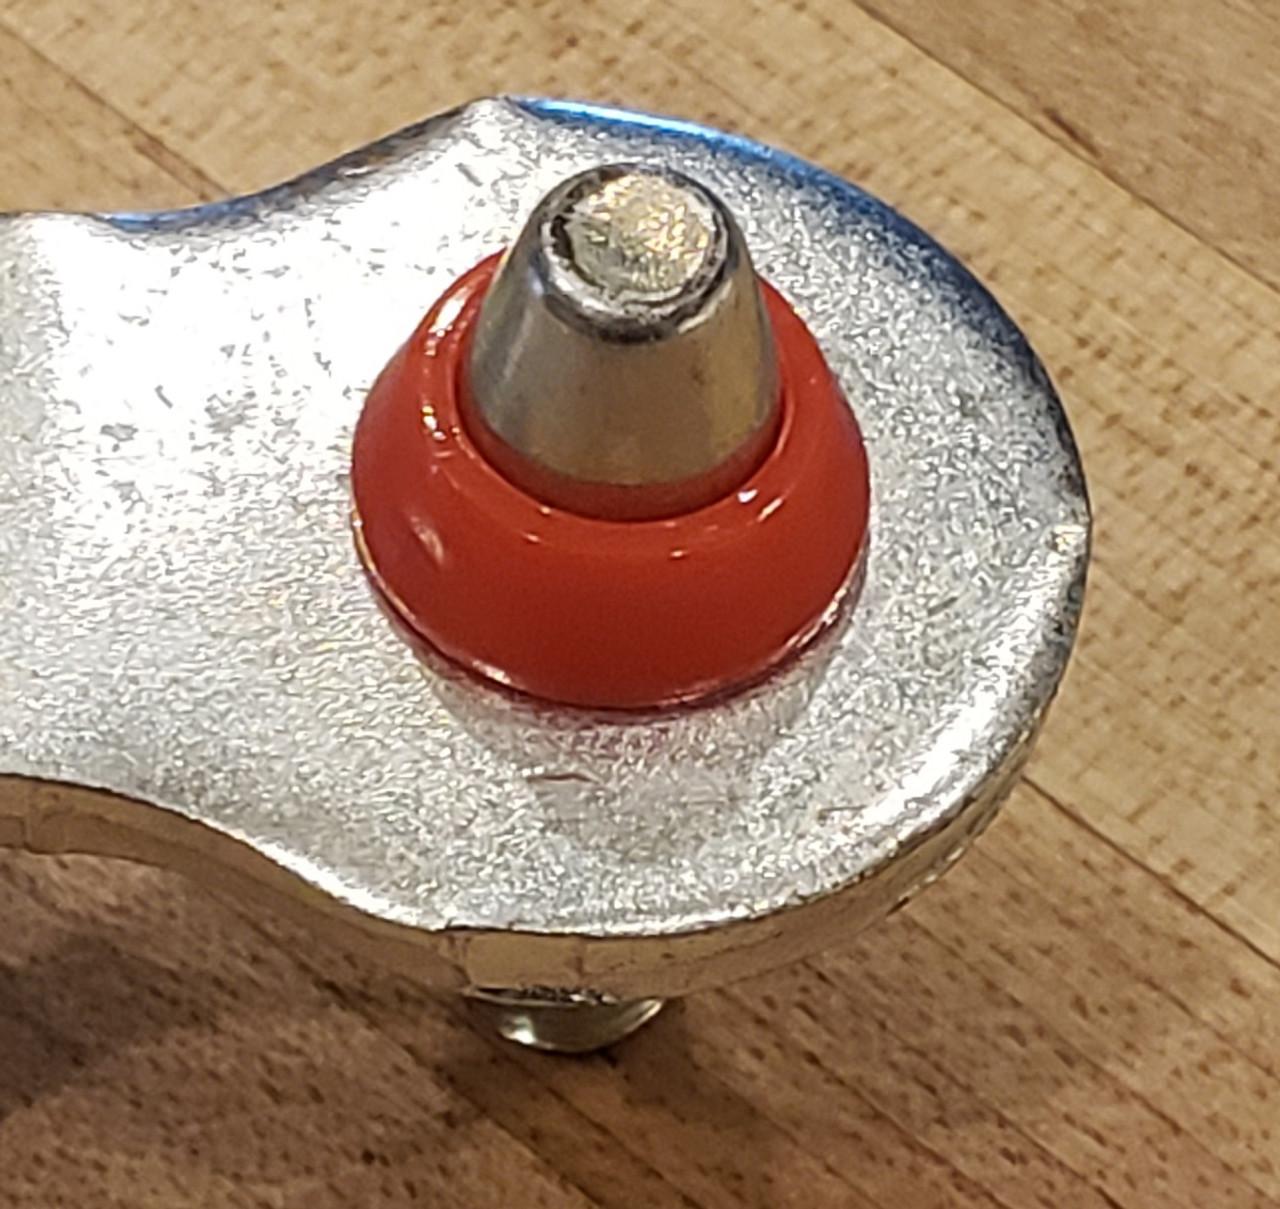 Mercury Lynx FA1KIT™ Transmission Shift Lever / Linkage Replacement Bushing Kit fits onto pin as shown.